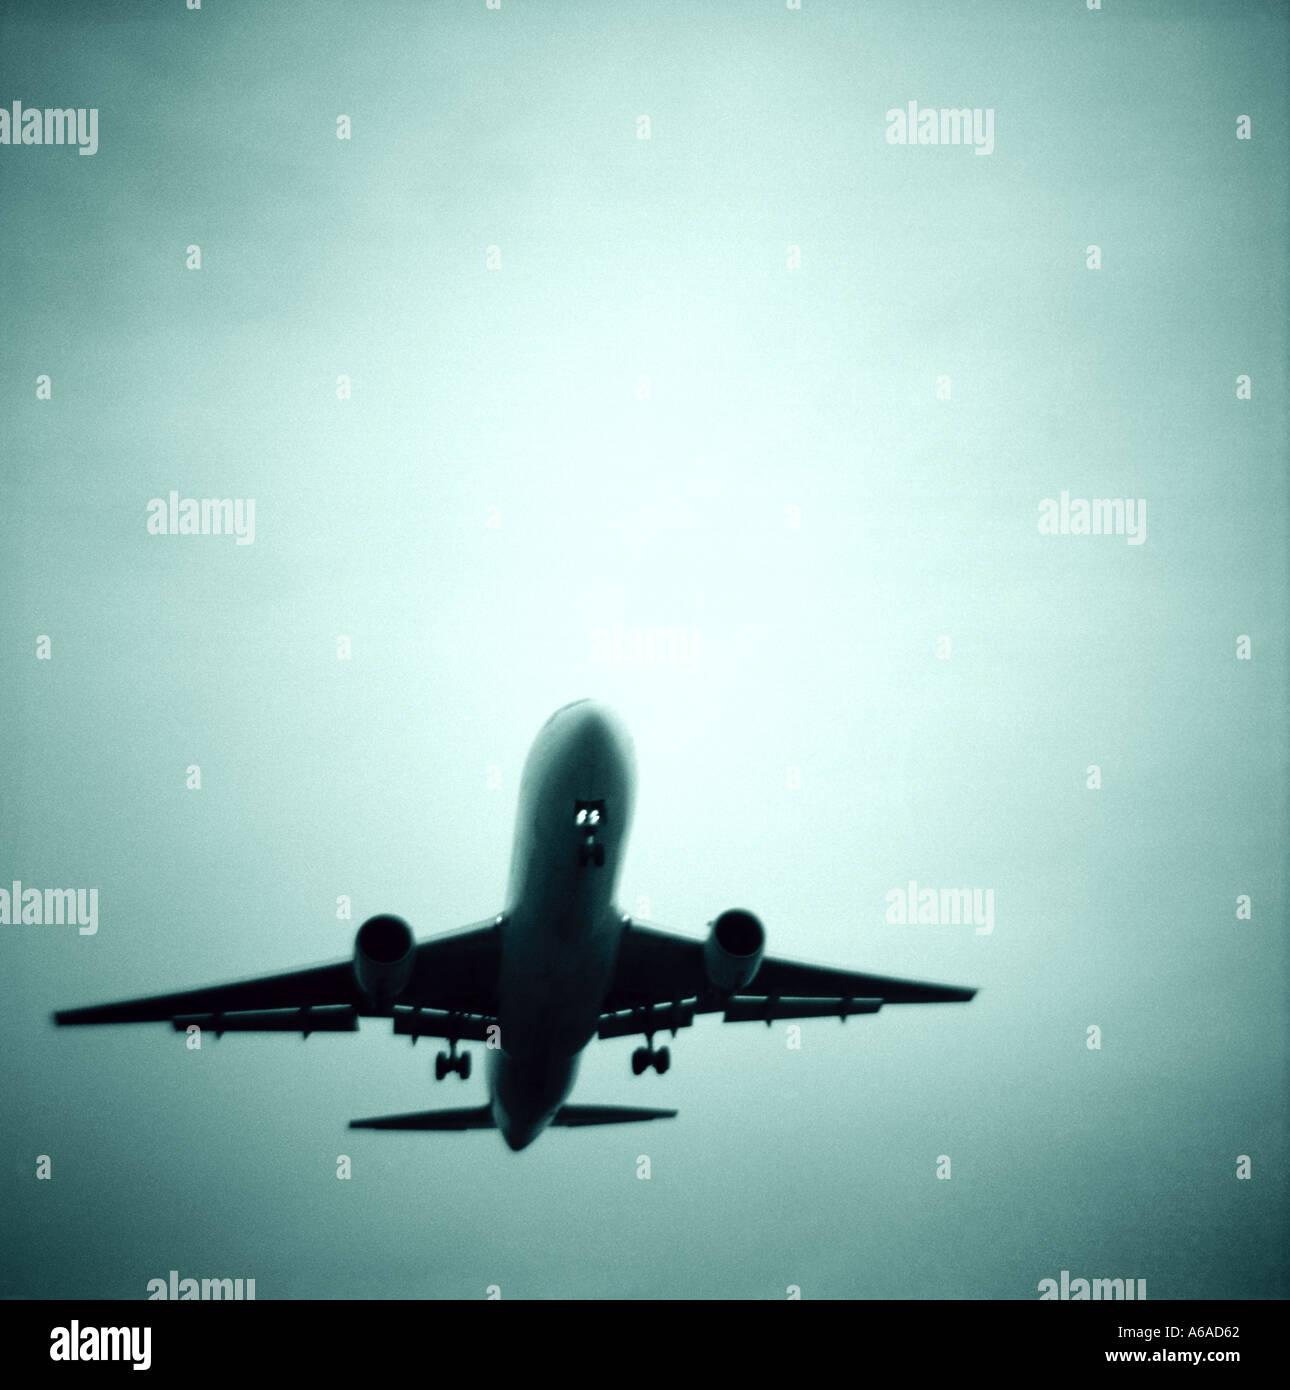 Passenger Jet On Landing Approach - Stock Image